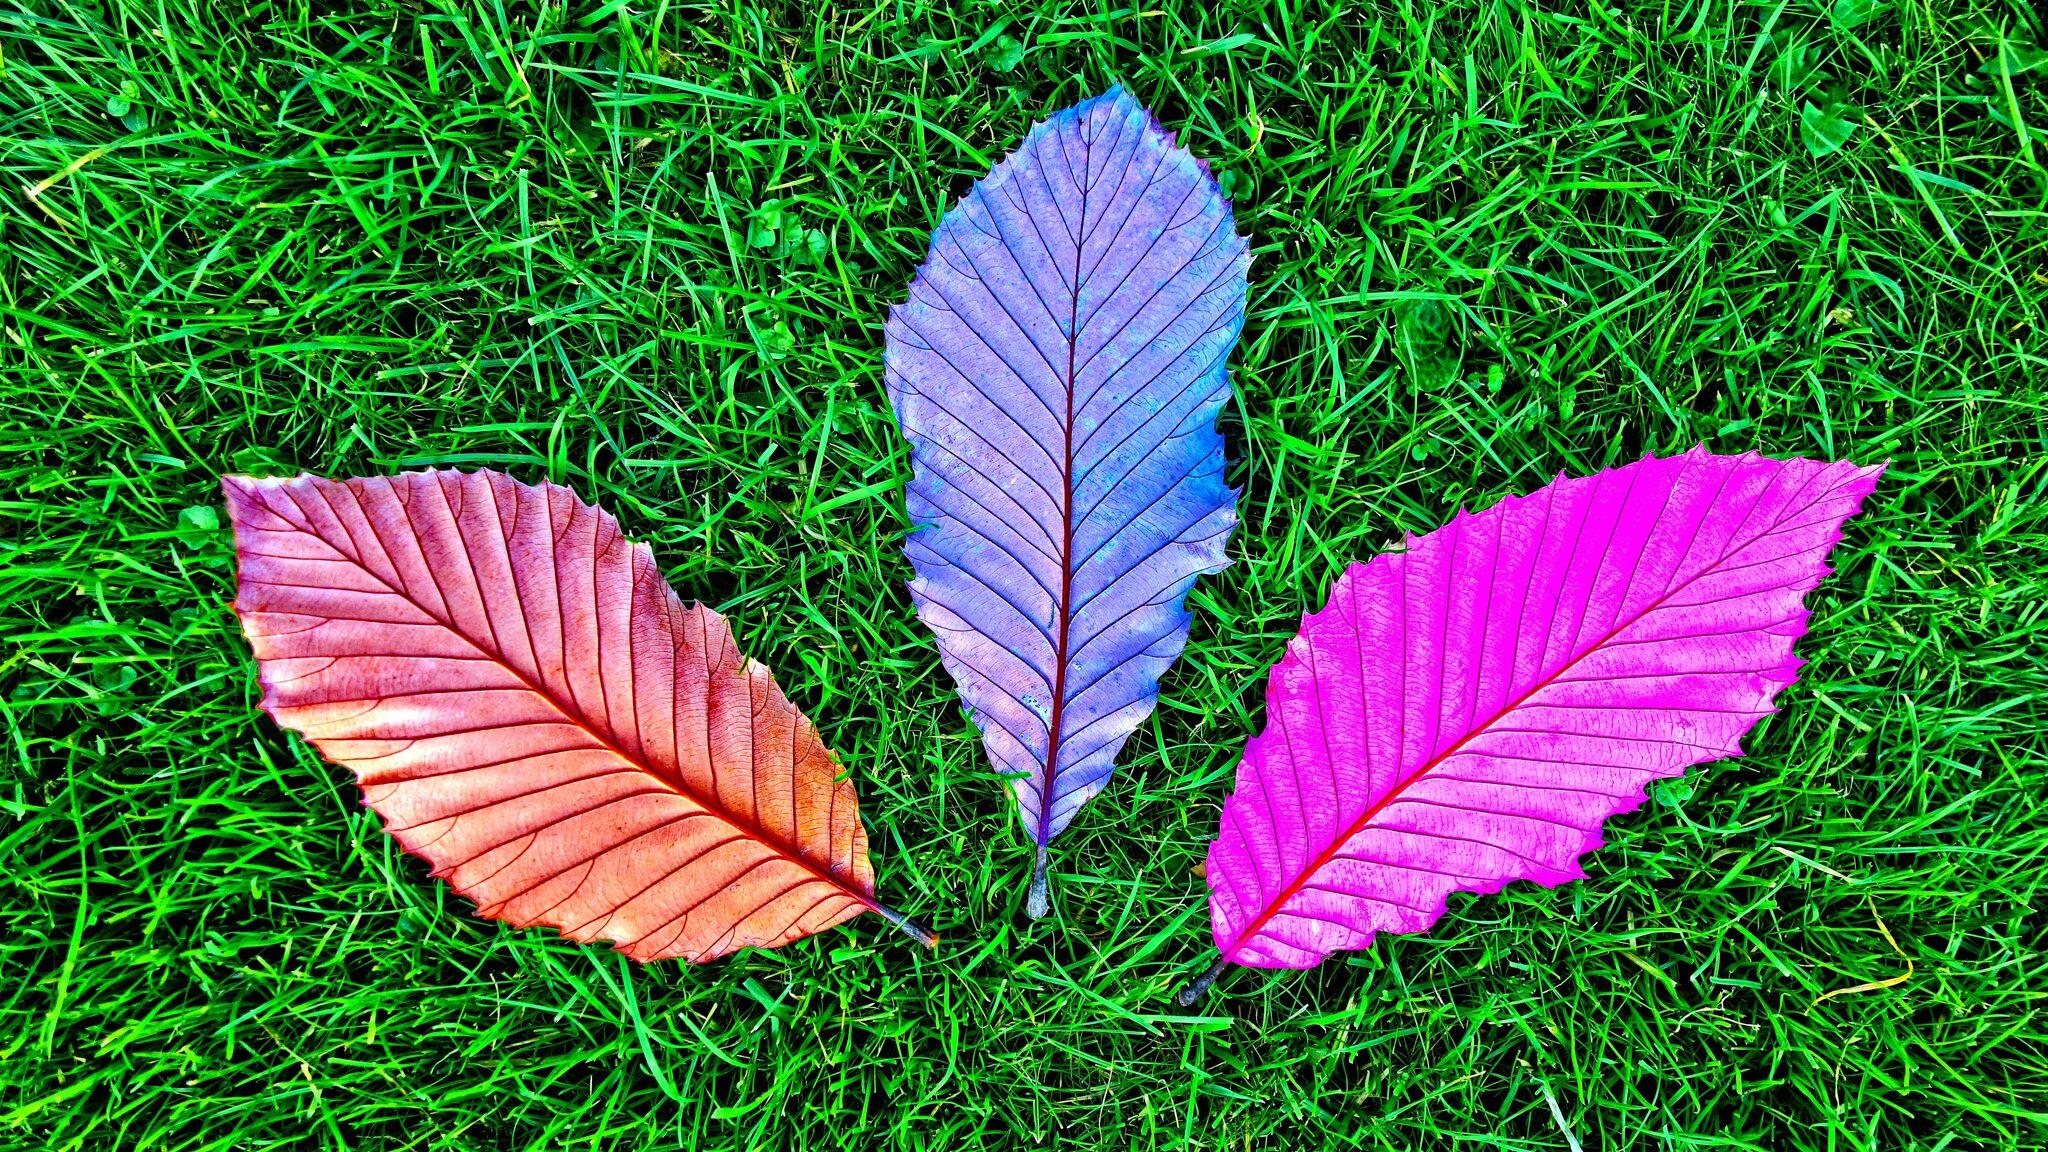 grass-fallen-colorful-leaves-5k-pz.jpg